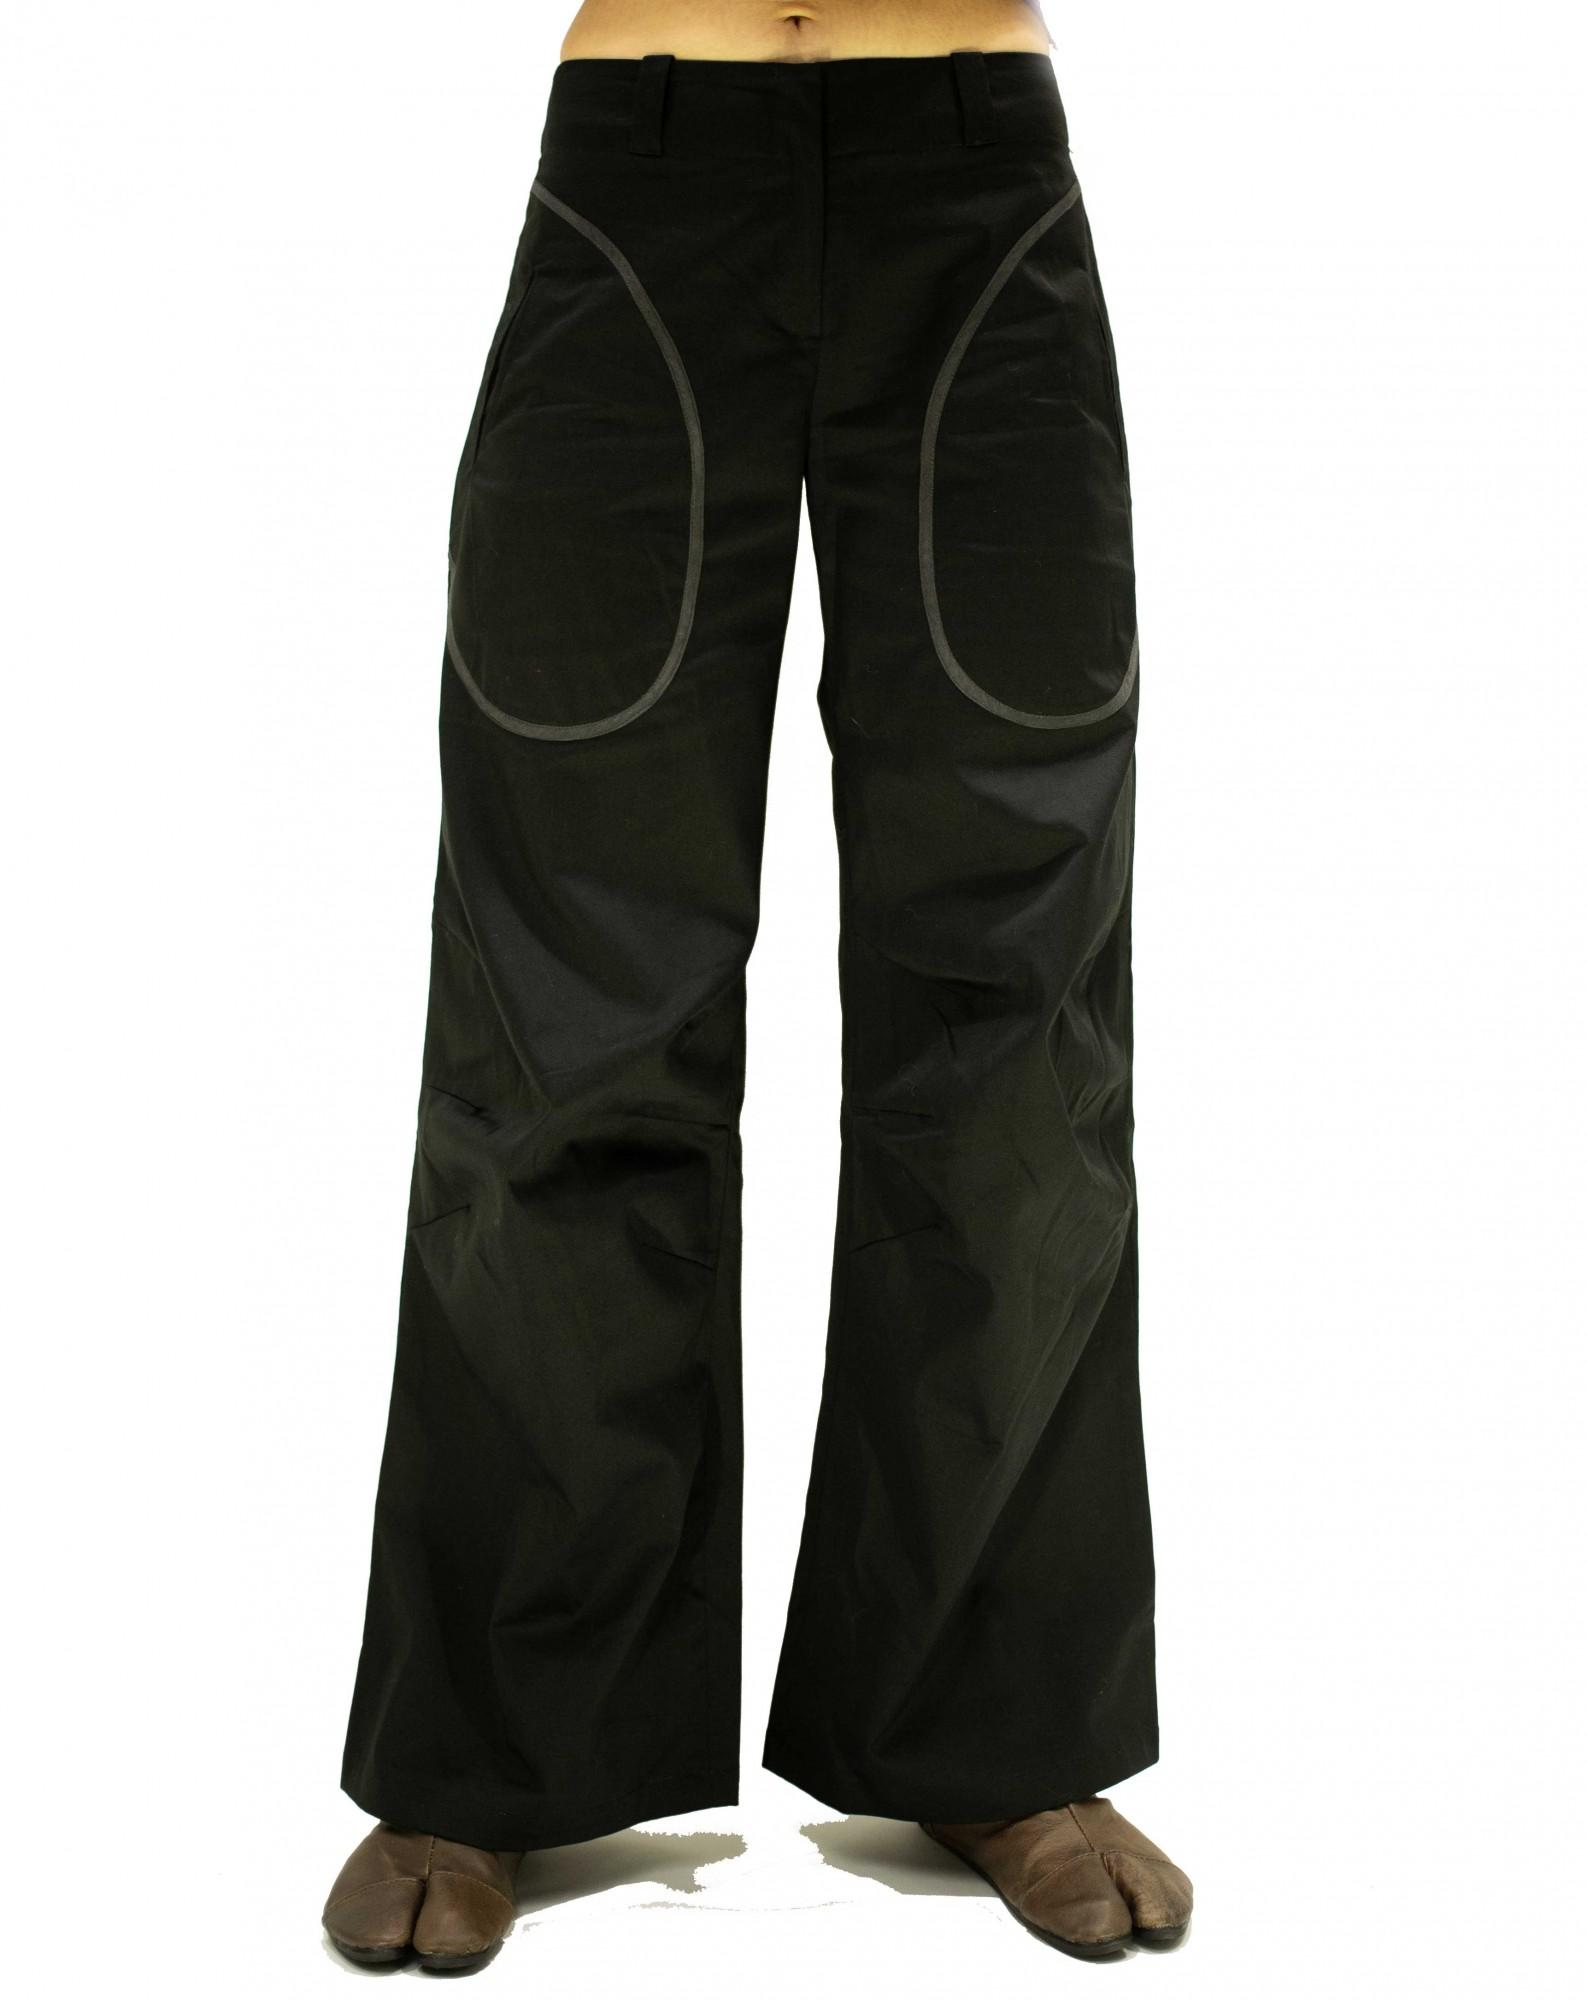 Pants fold knees